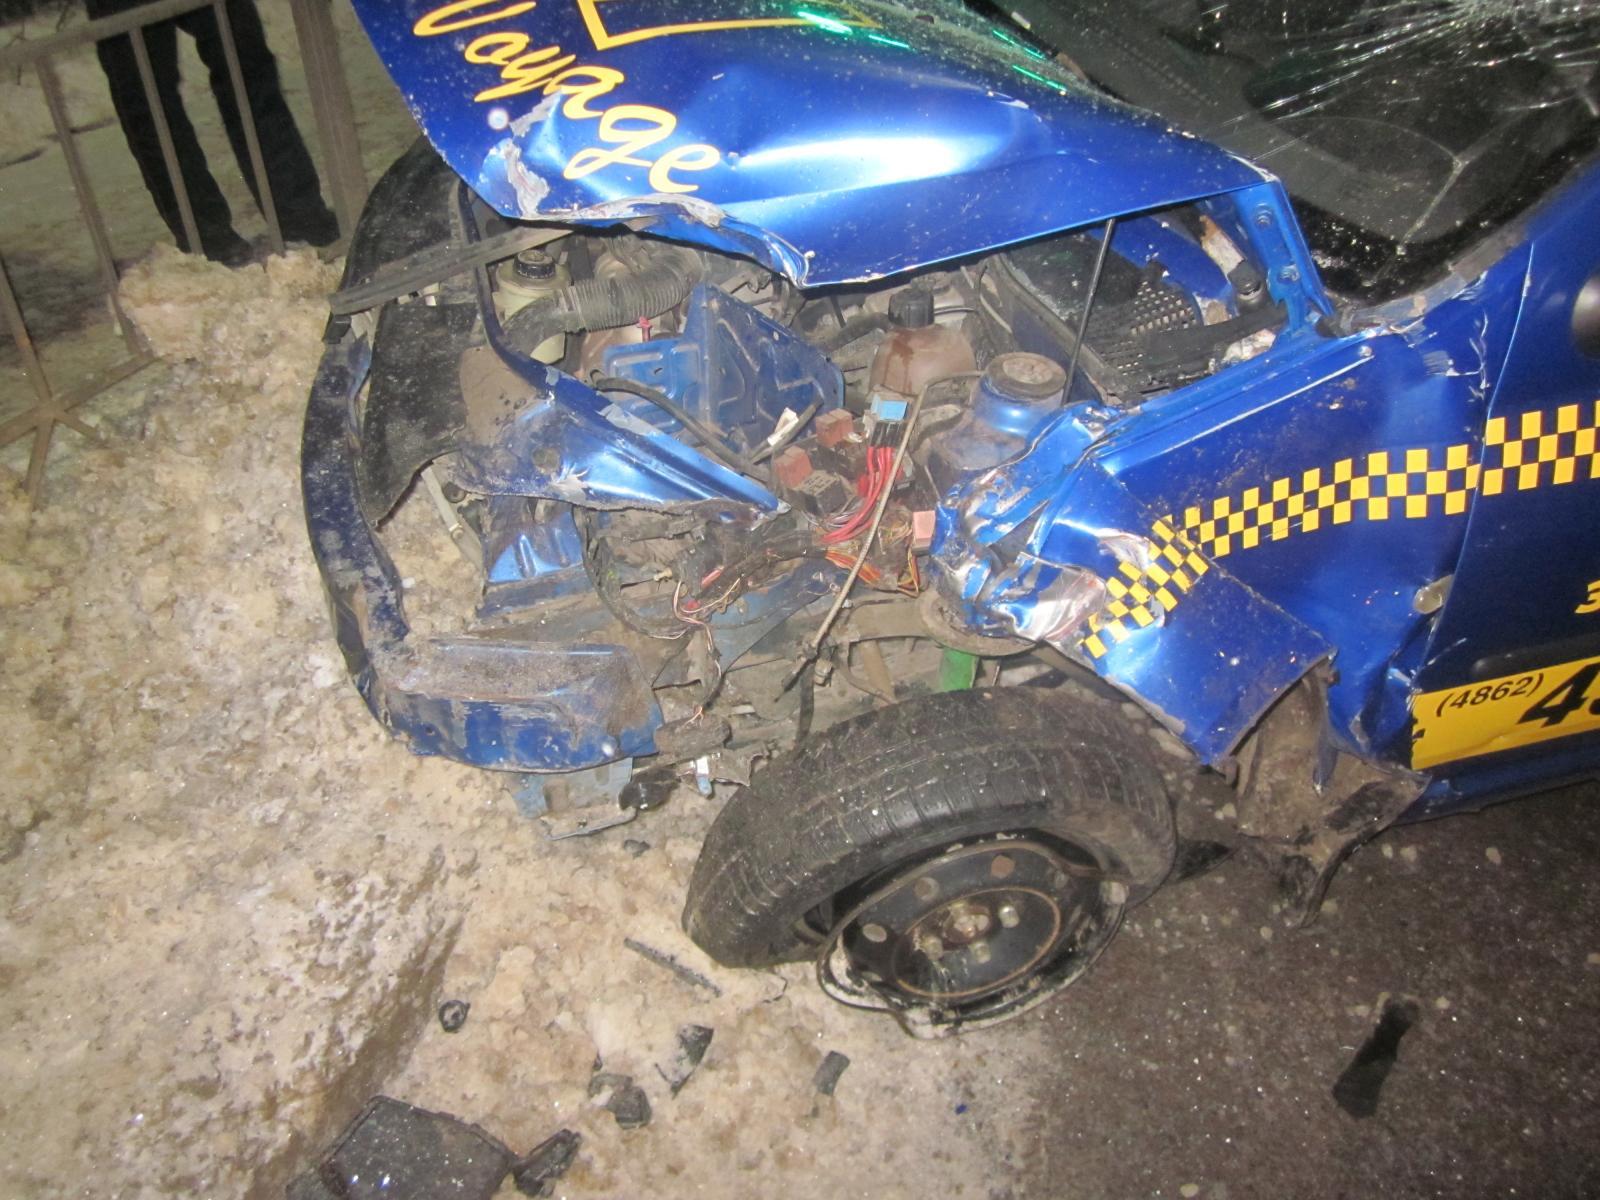 ВОрле в итоге столкновения ВАЗ и Рено пострадали 4 человека